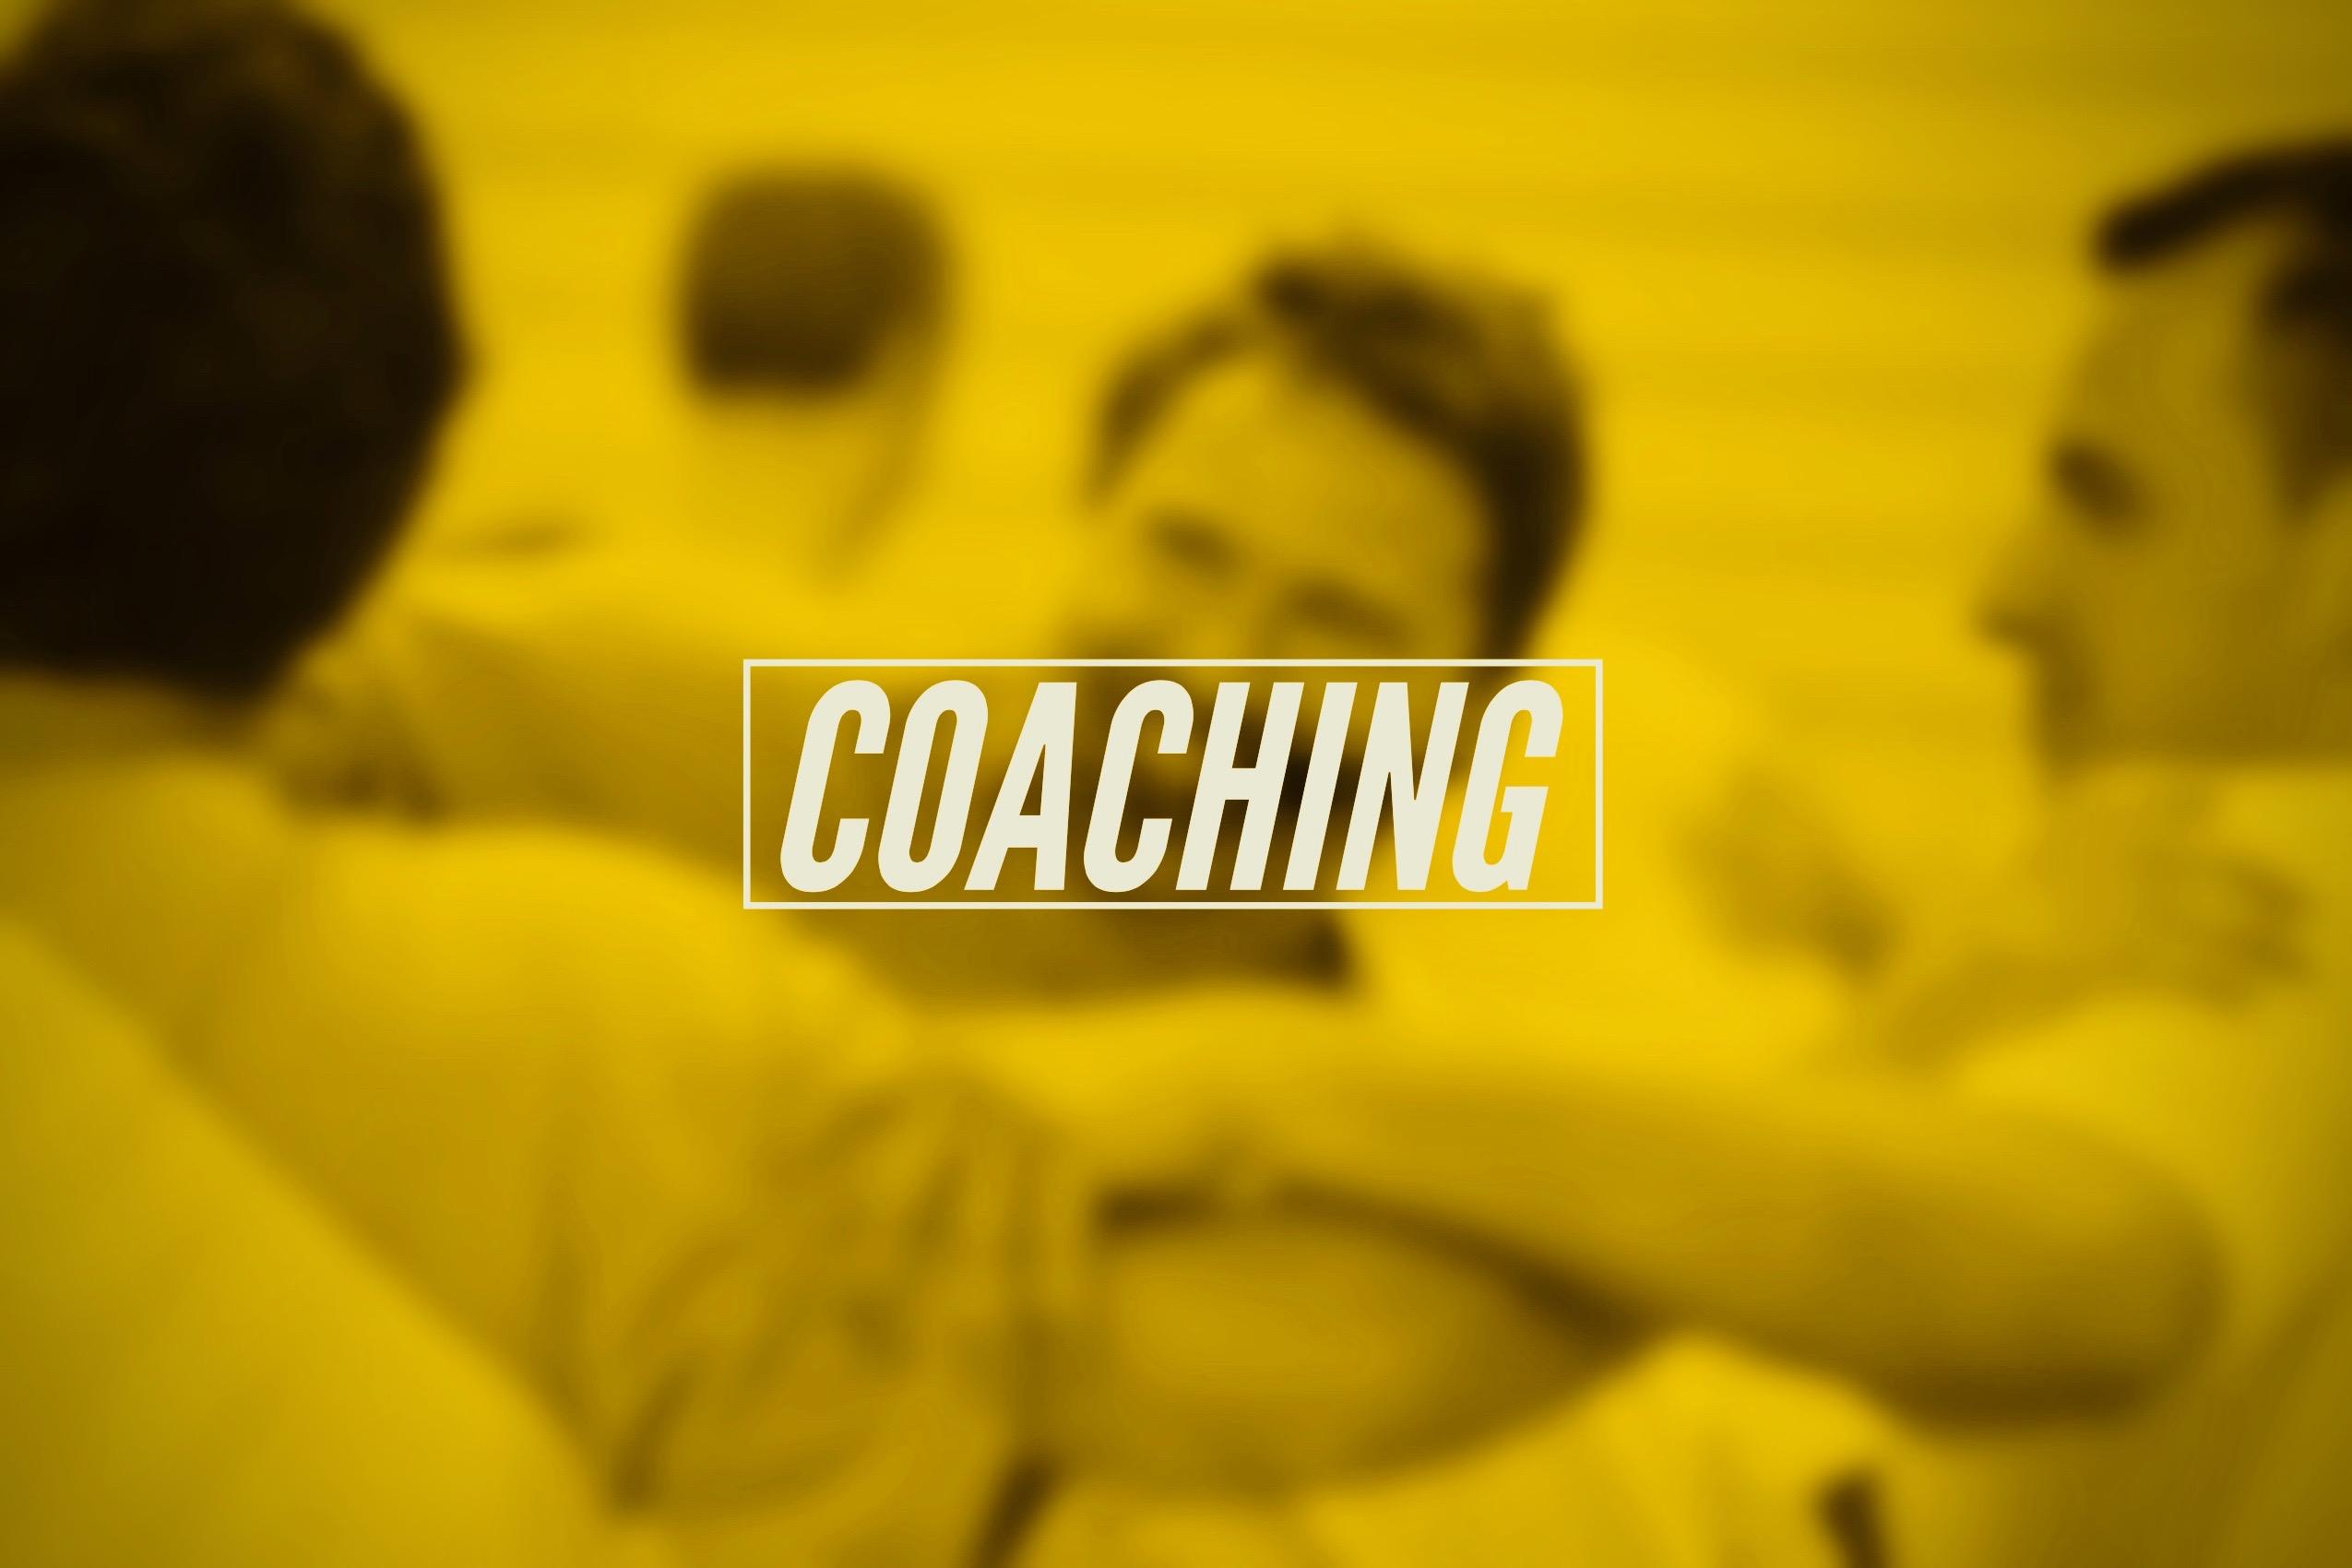 Coaching Selbstverteidigung Kampfkunst Lüneburg